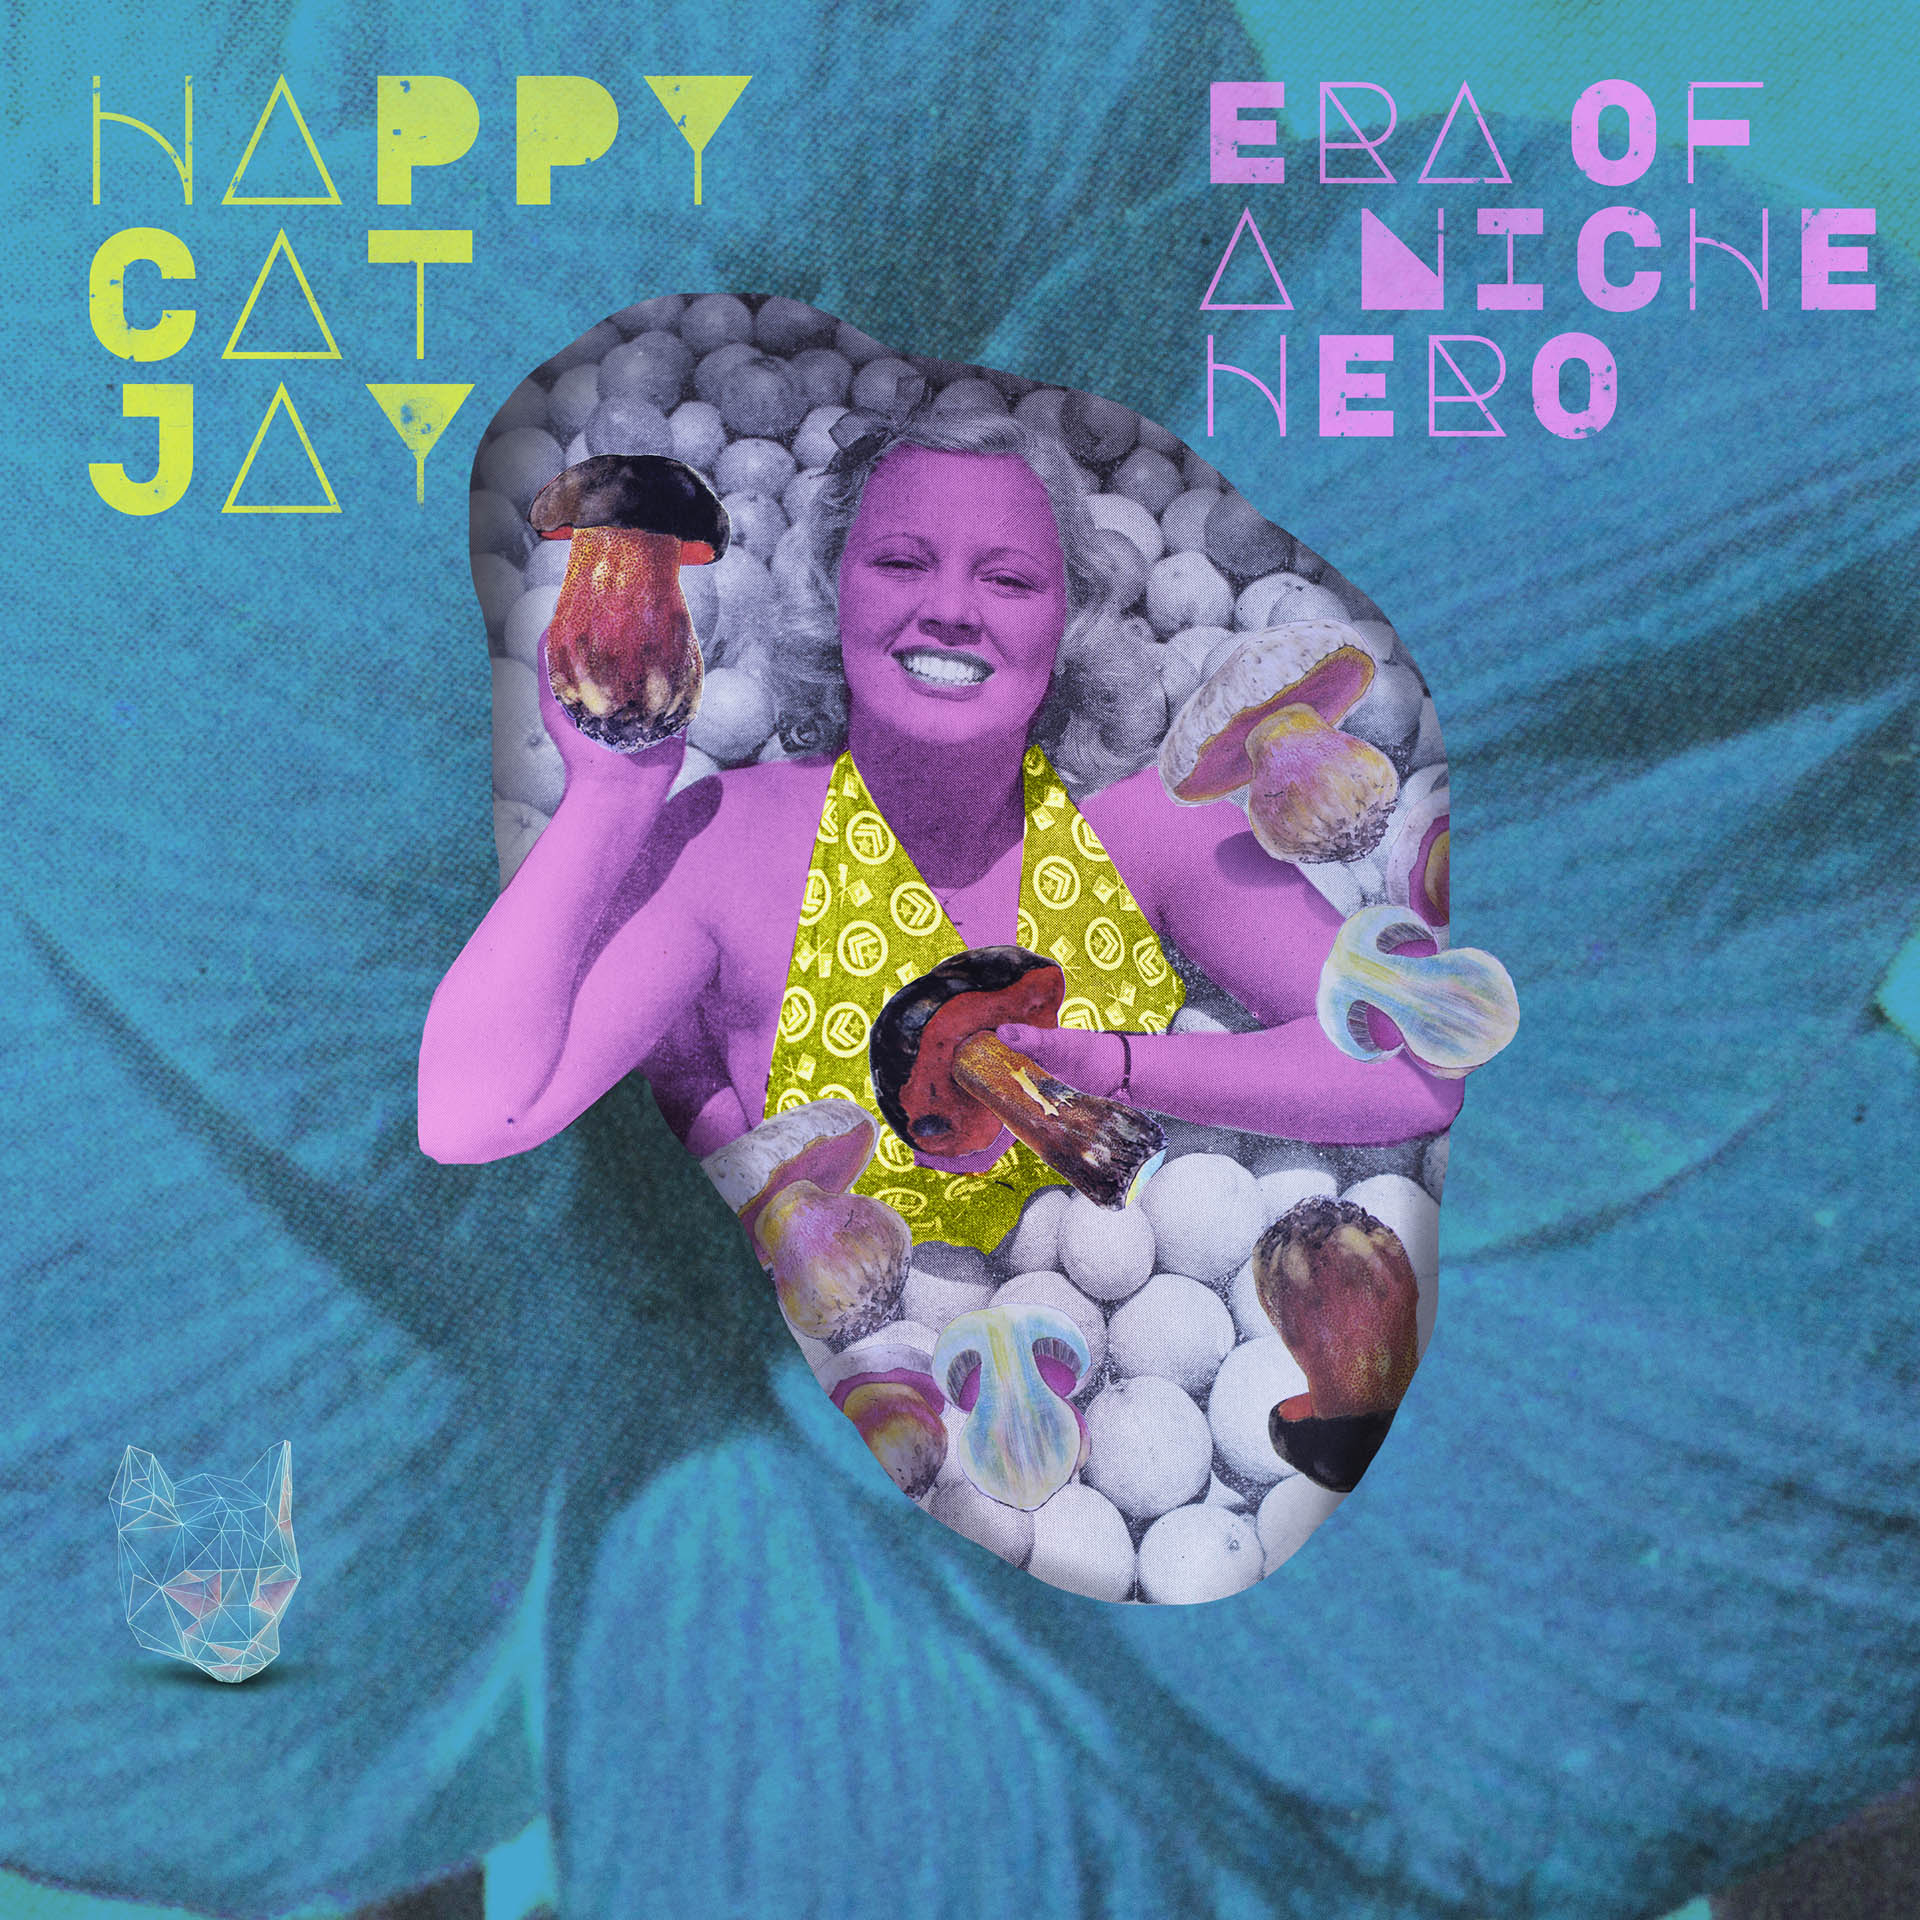 Happy Cat Jay - Era of a Niche Hero